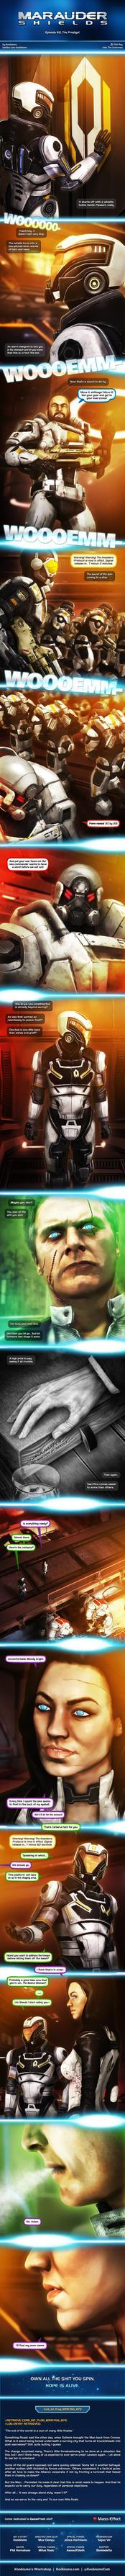 Marauder Shields: Episode 62 (The Prodigal) by koobismo